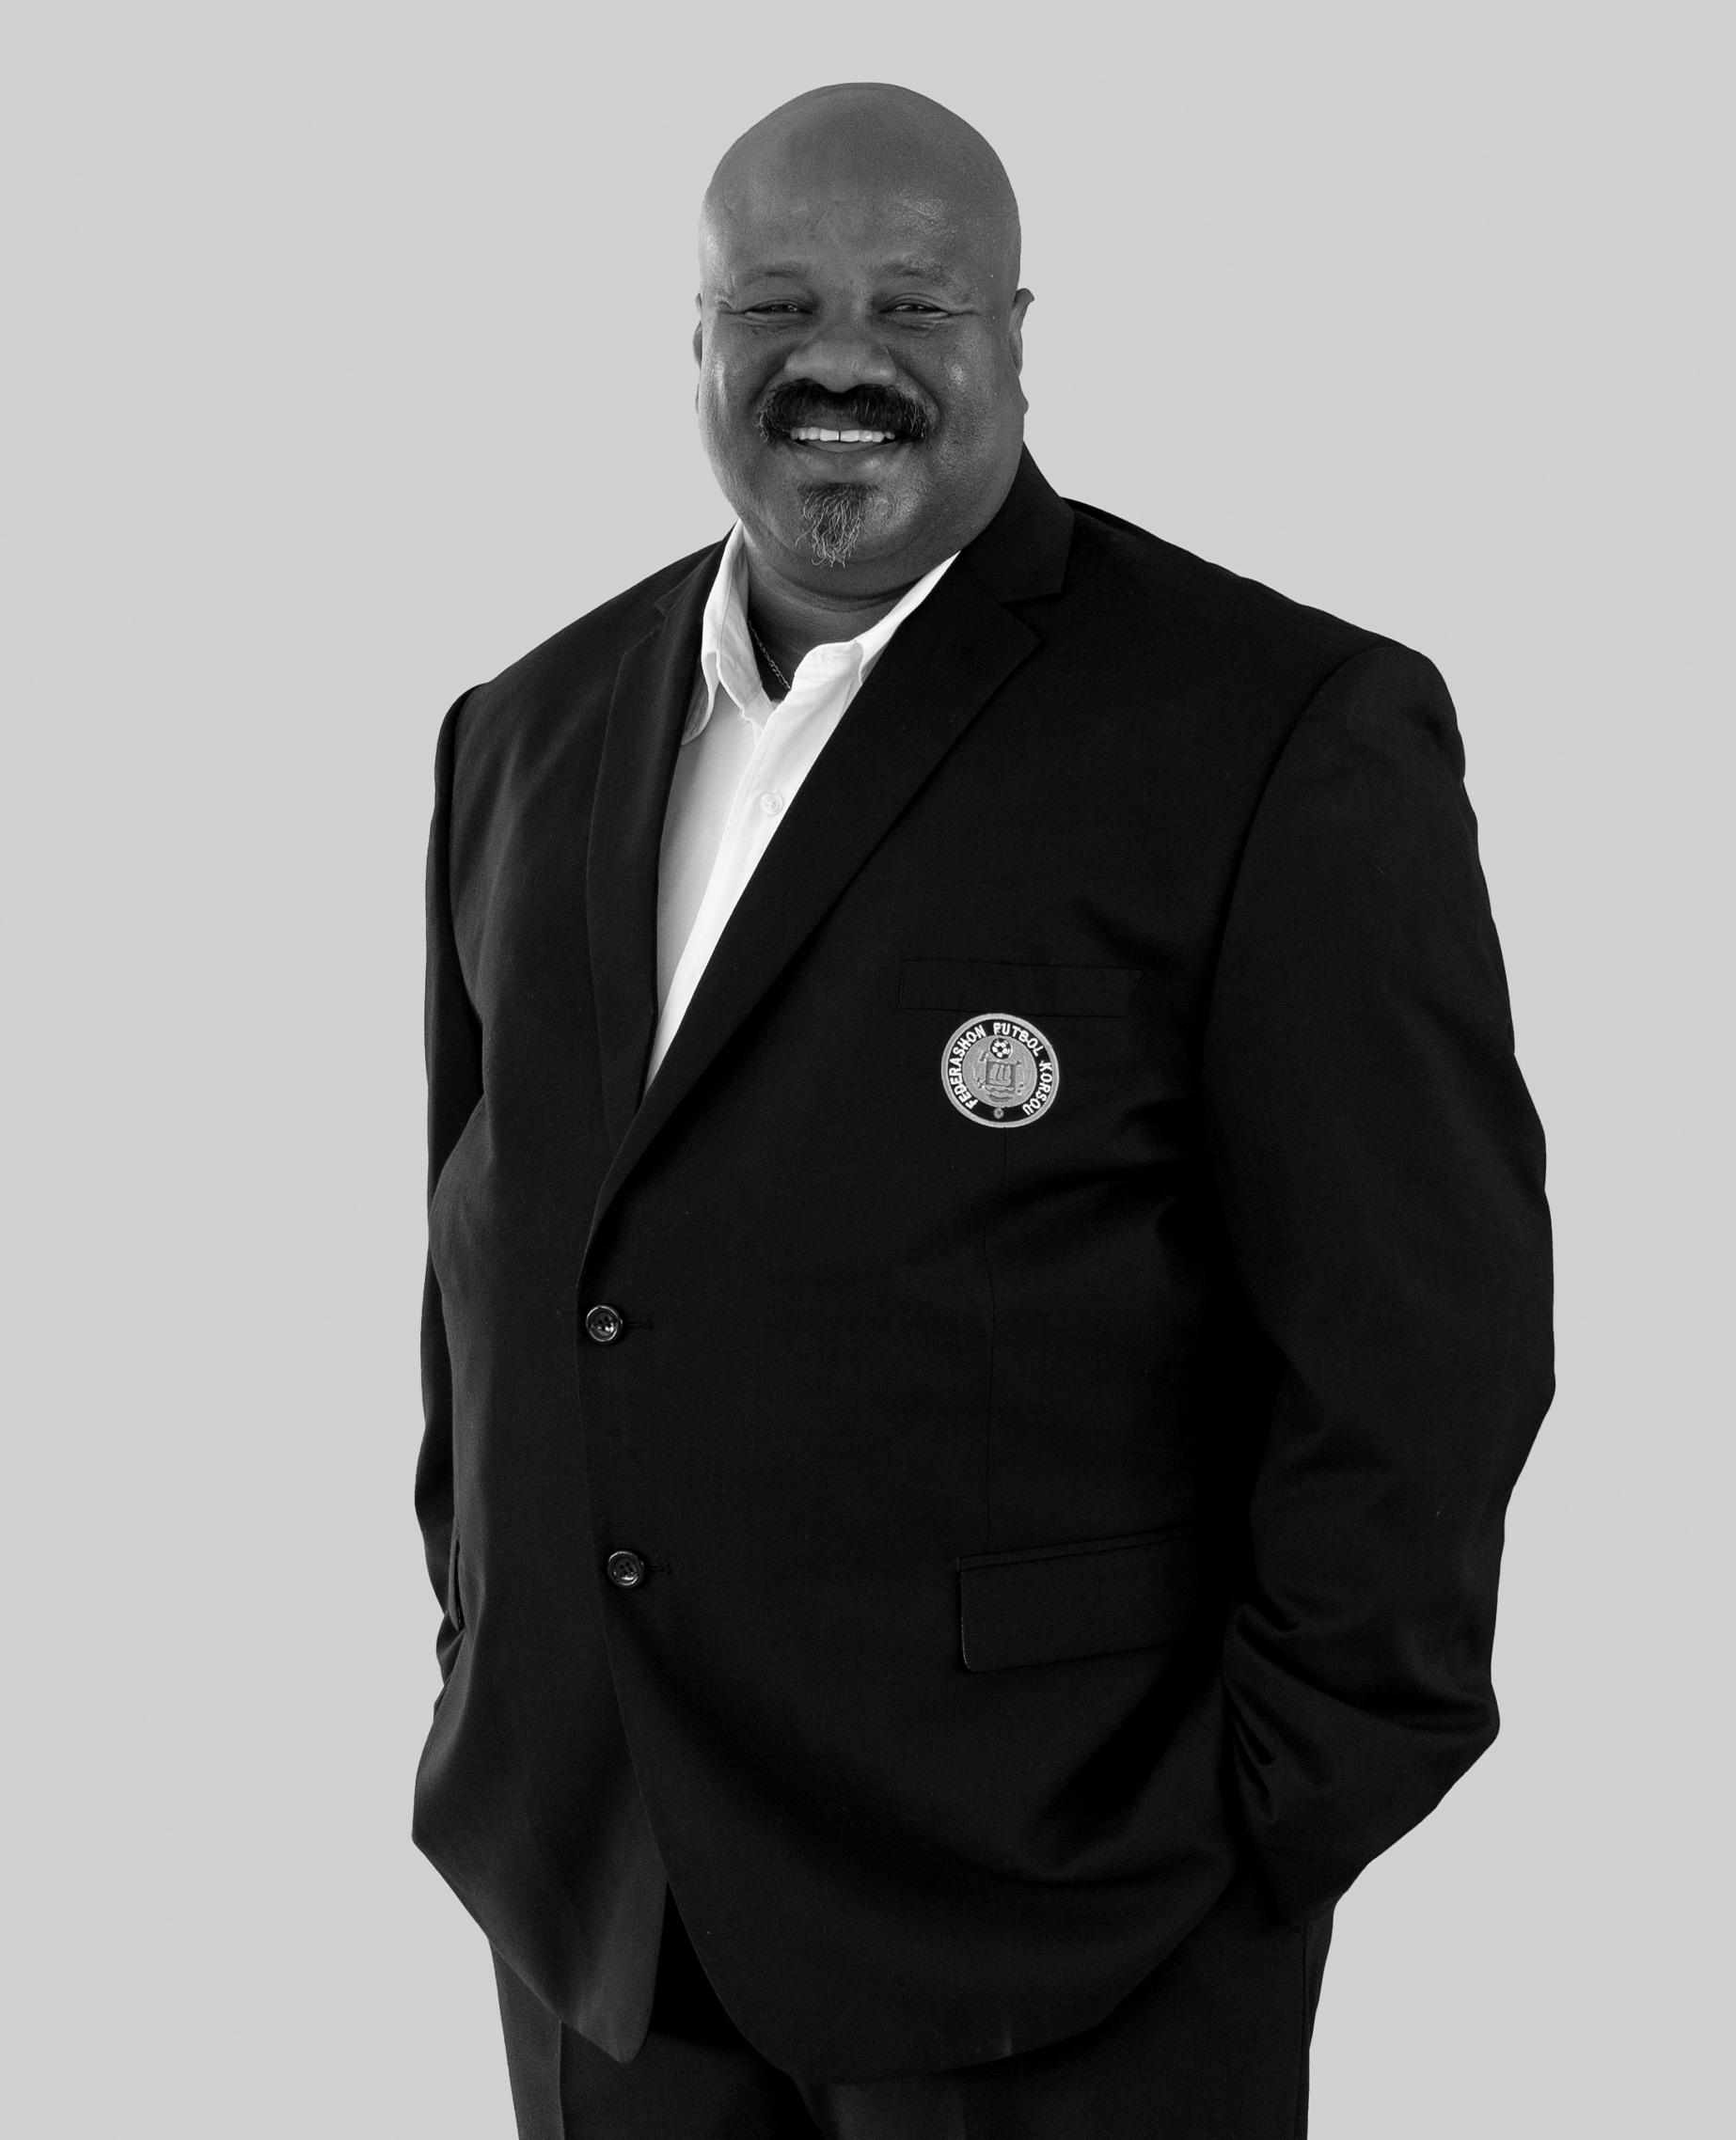 Urvin Faneijte, is a board member of Curacao Football Federation.